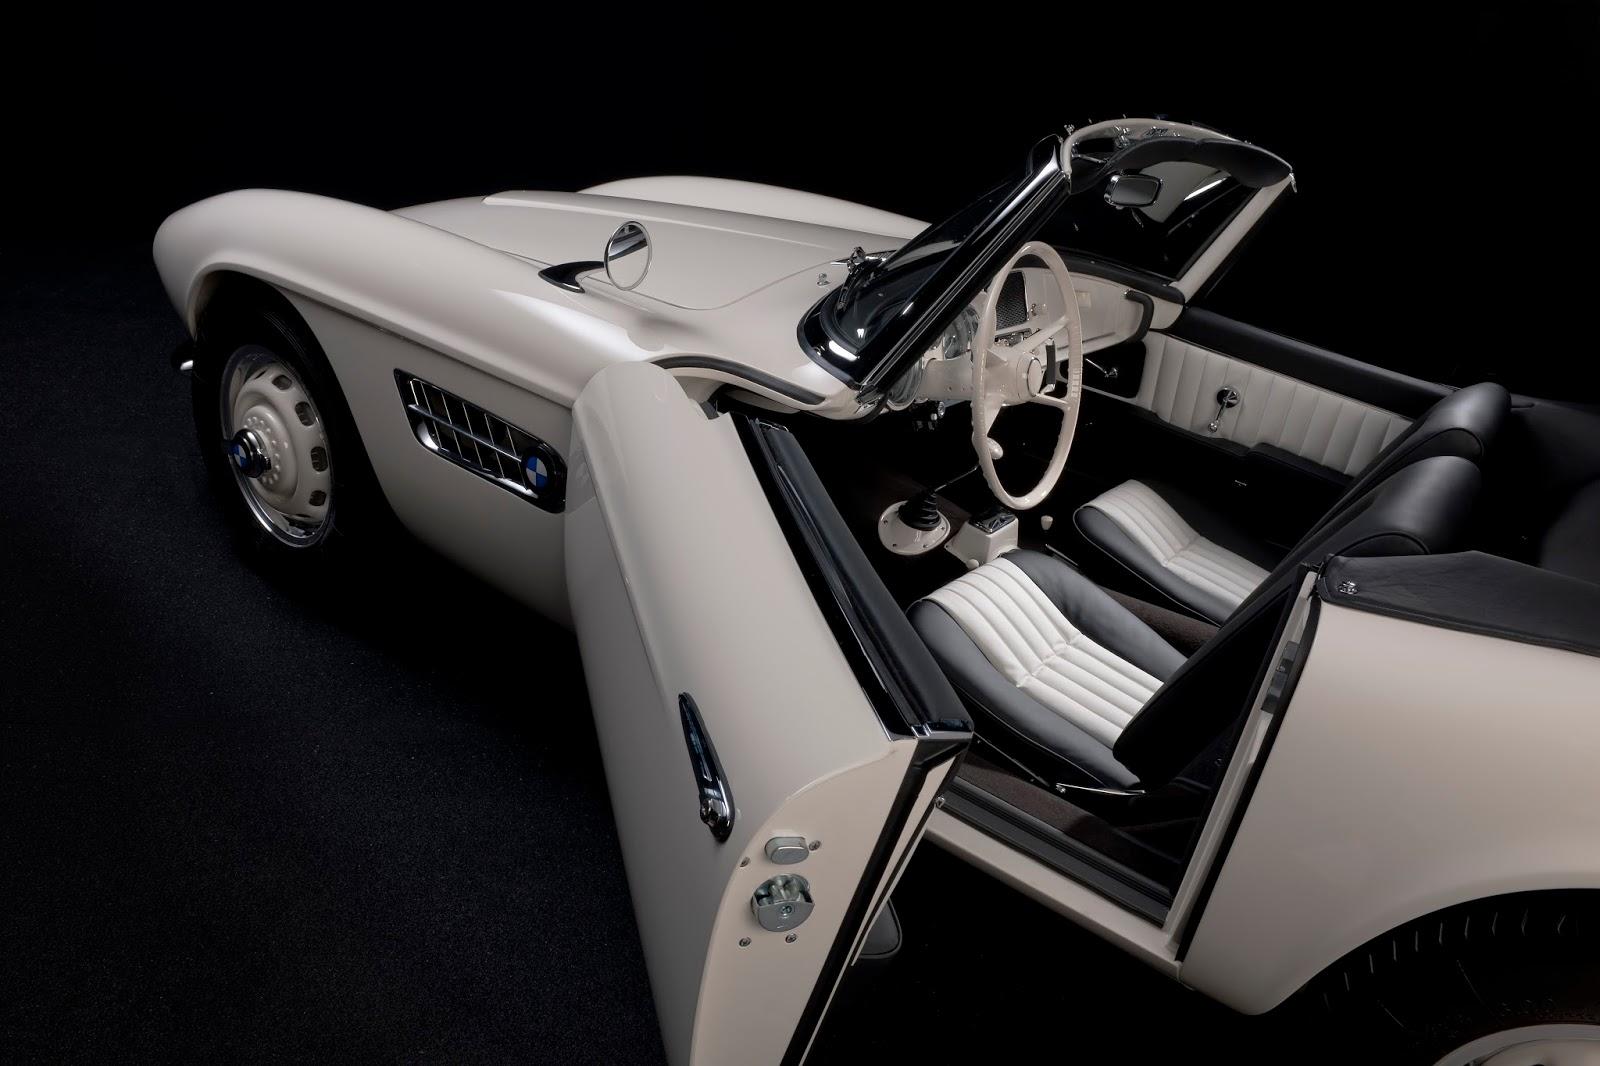 P90229728 highRes elvis bmw 507 08 201 Η επιστροφή της μυθικής BMW 507 του Elvis στο Concours d'Elegance, Pebble Beach autoshow, BMW, BMW 507, Classic, Concours d'Elegance, Roadster, zblog